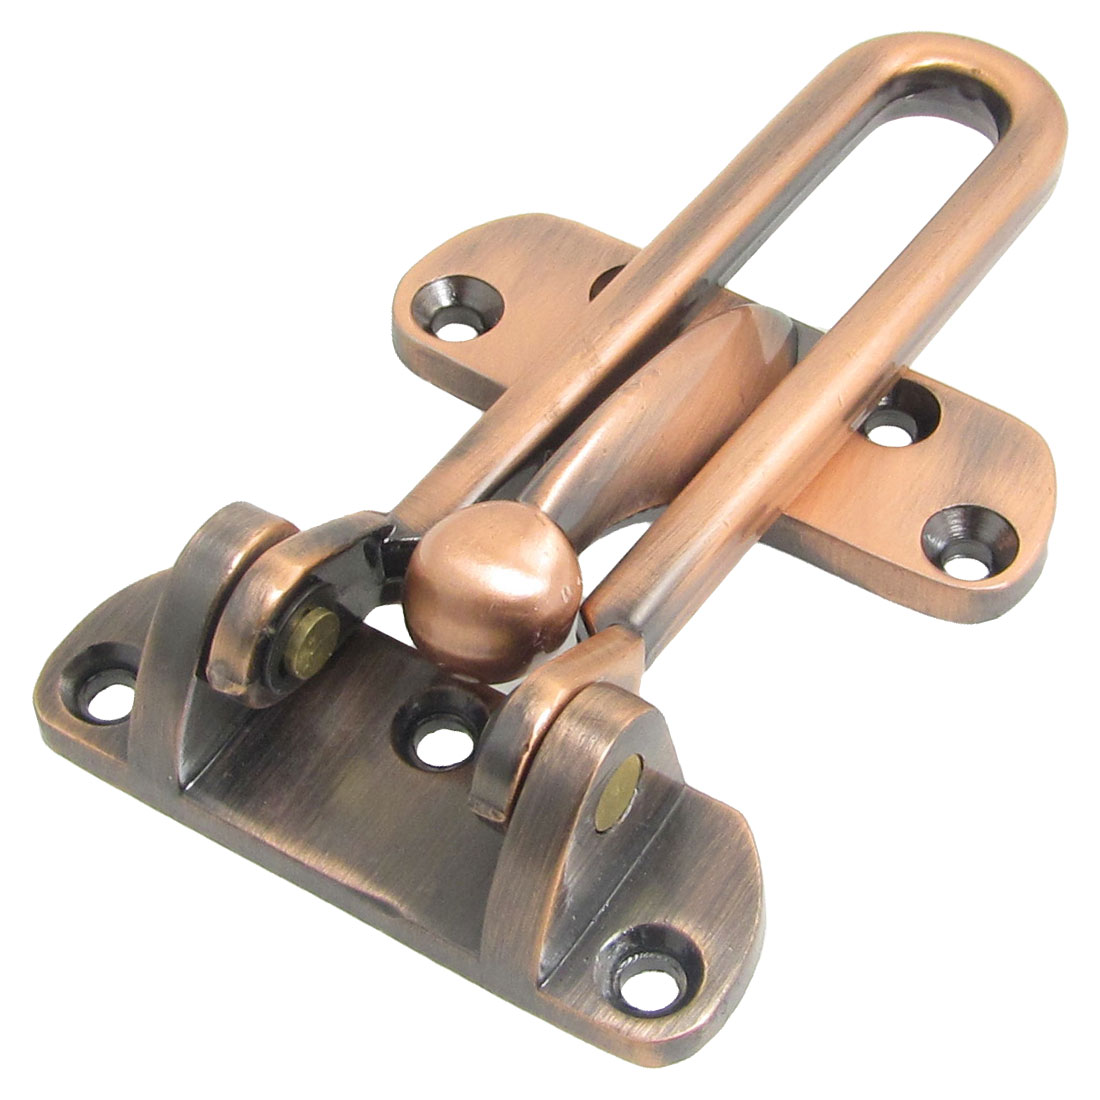 Unique Bargains Unique Bargains Hardware Part Bronze Tone Metal Security Door Buckle w Screws